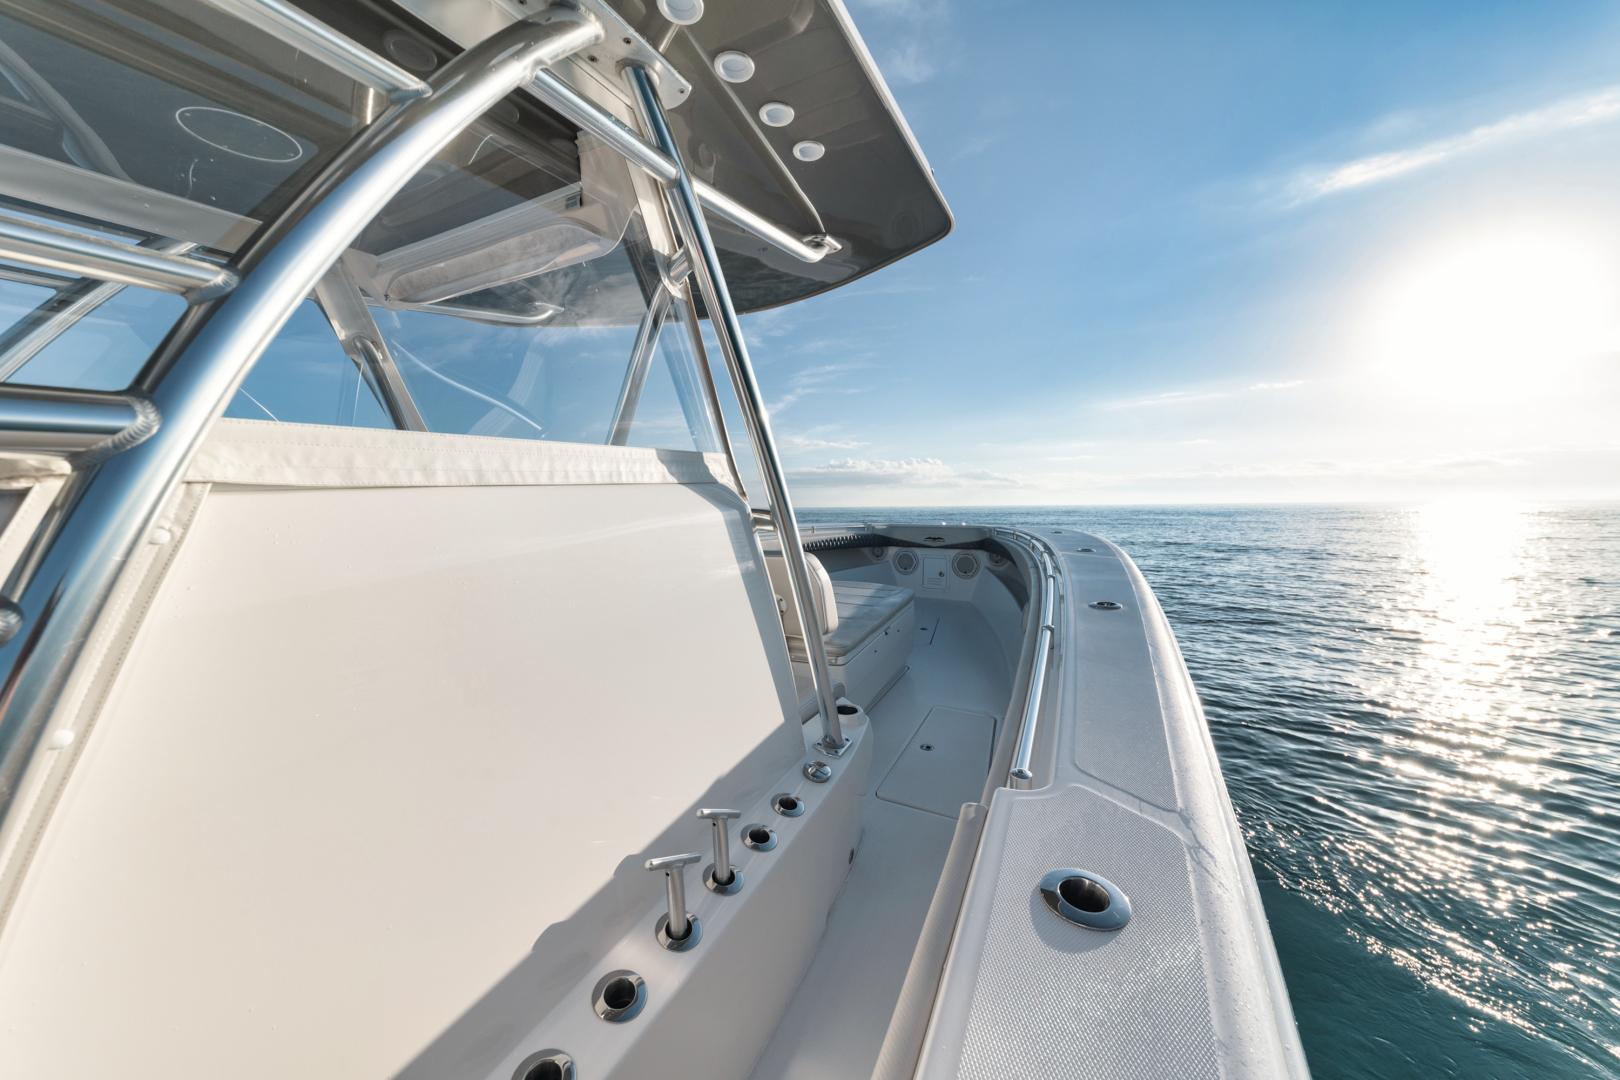 Invincible-Open Fisherman 2017-42 Invincible Jupiter-Florida-United States-1604182   Thumbnail